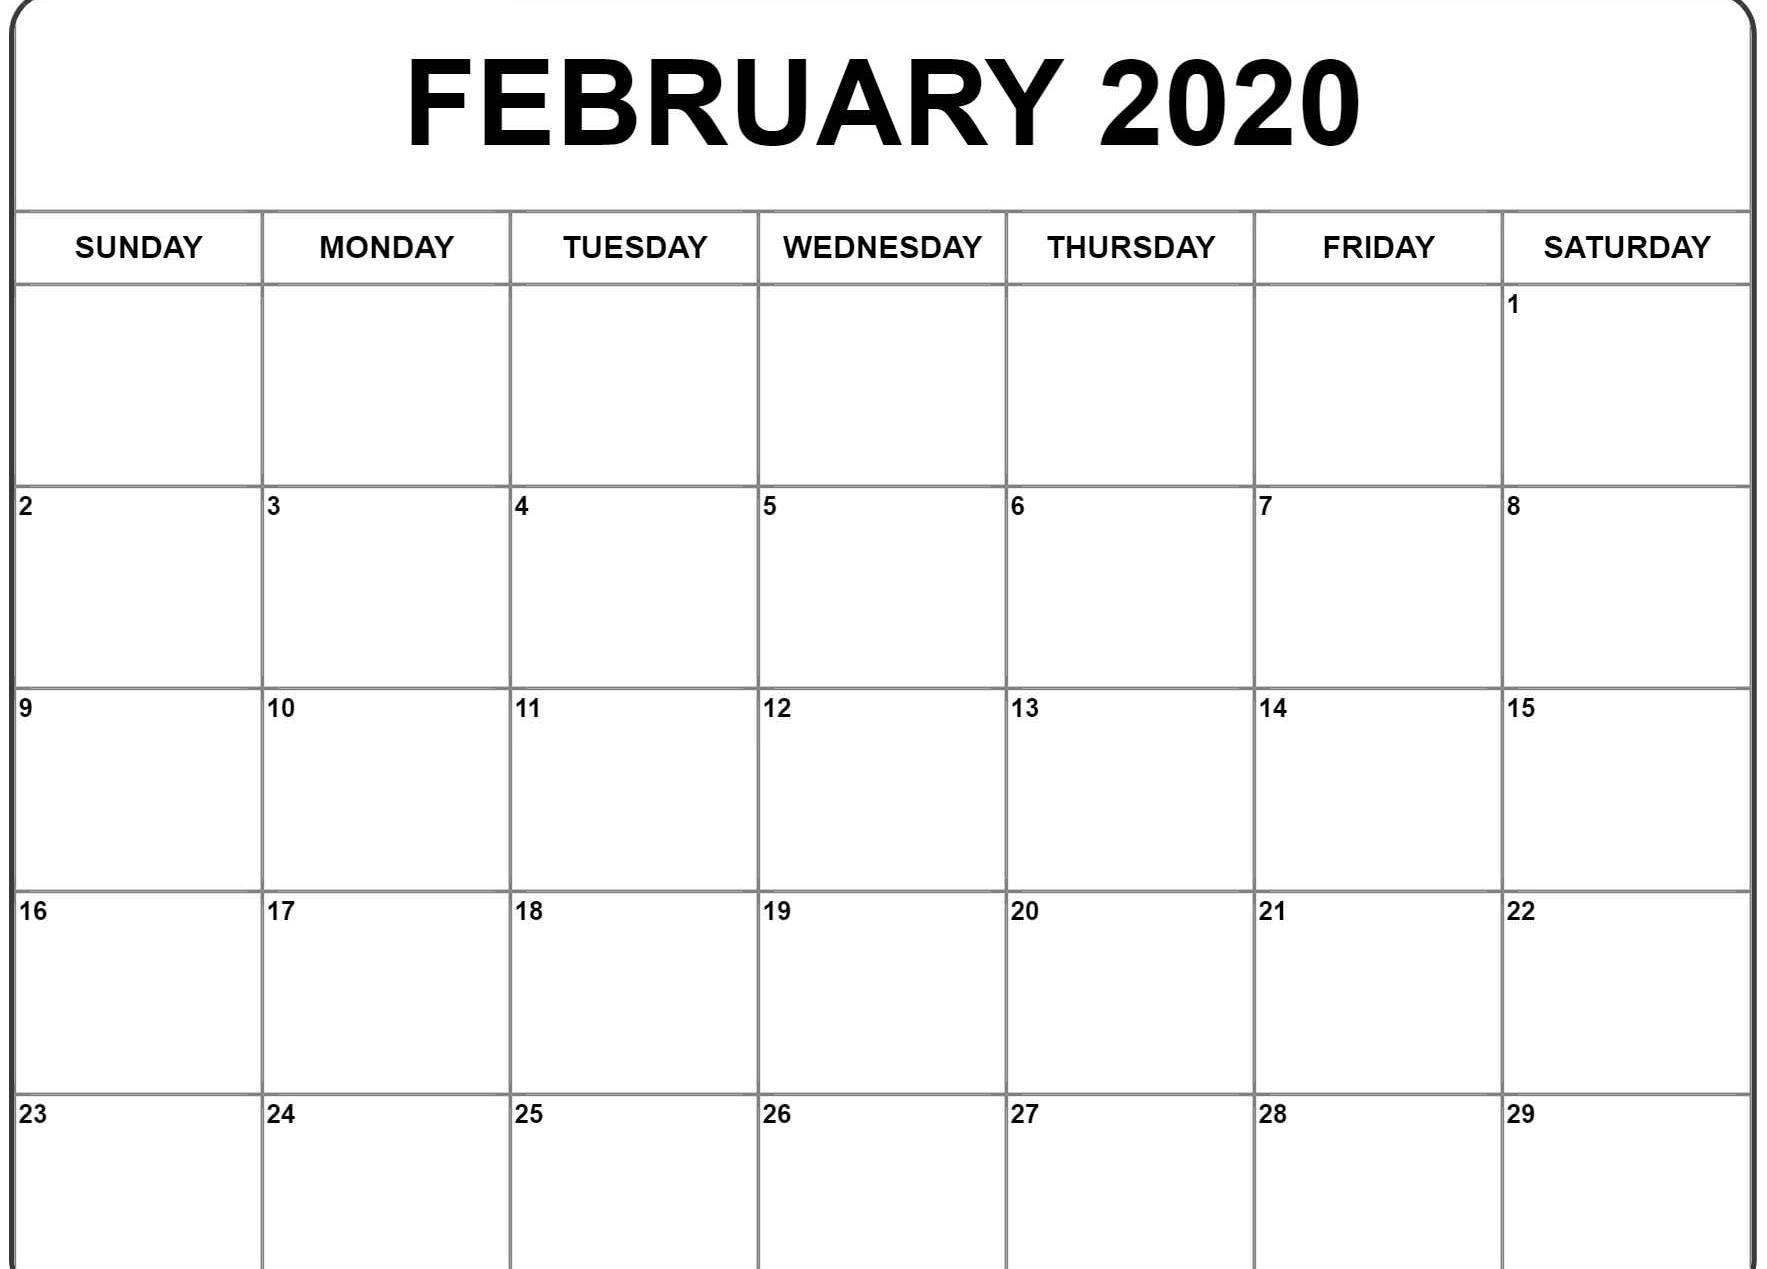 February 2020 Calendar Word | February Calendar, Free